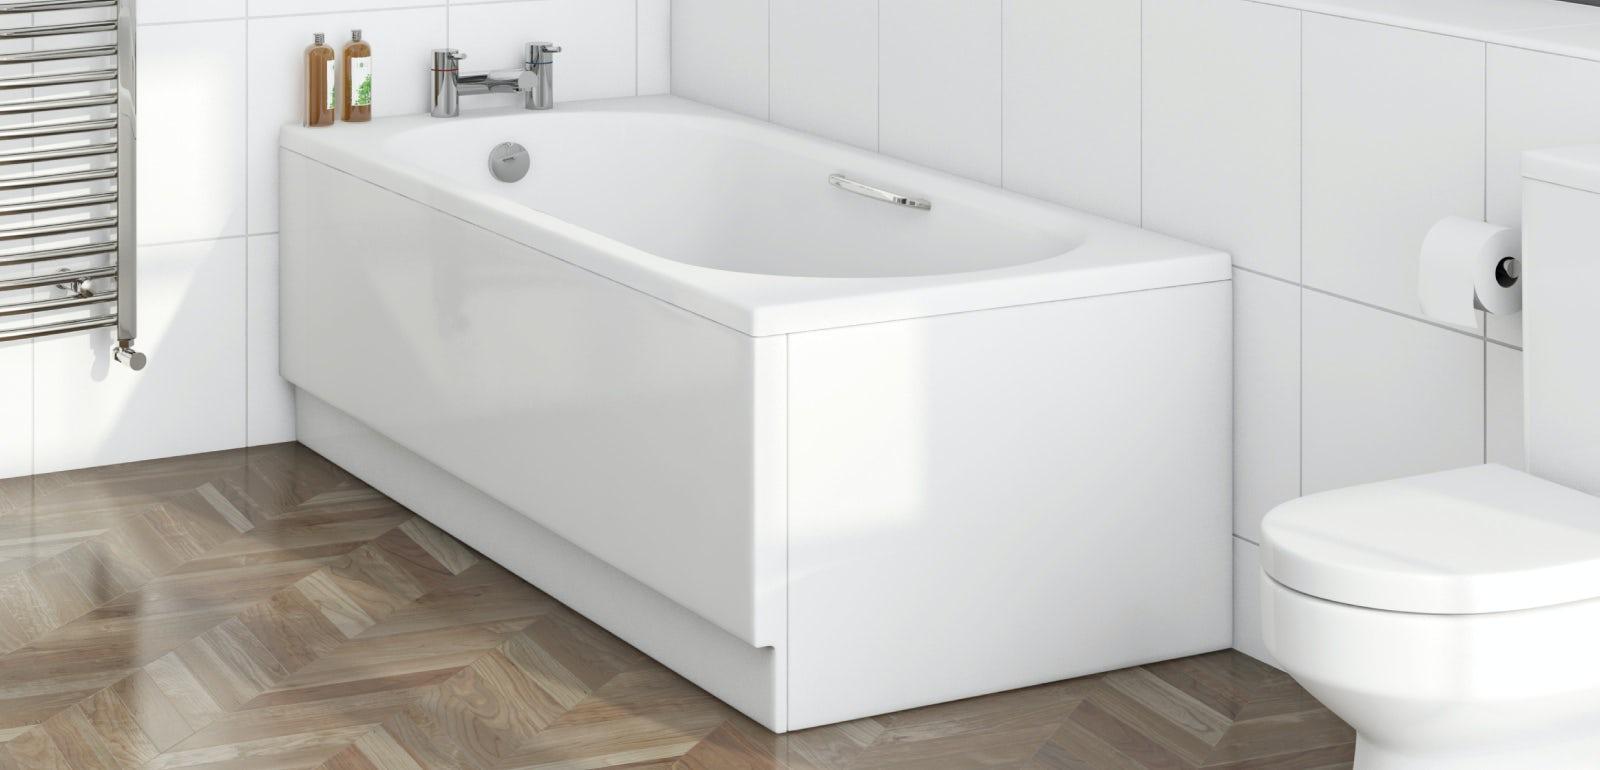 Image Of Minimum Bathroom Size Bathtub minimum size for bathroom ...